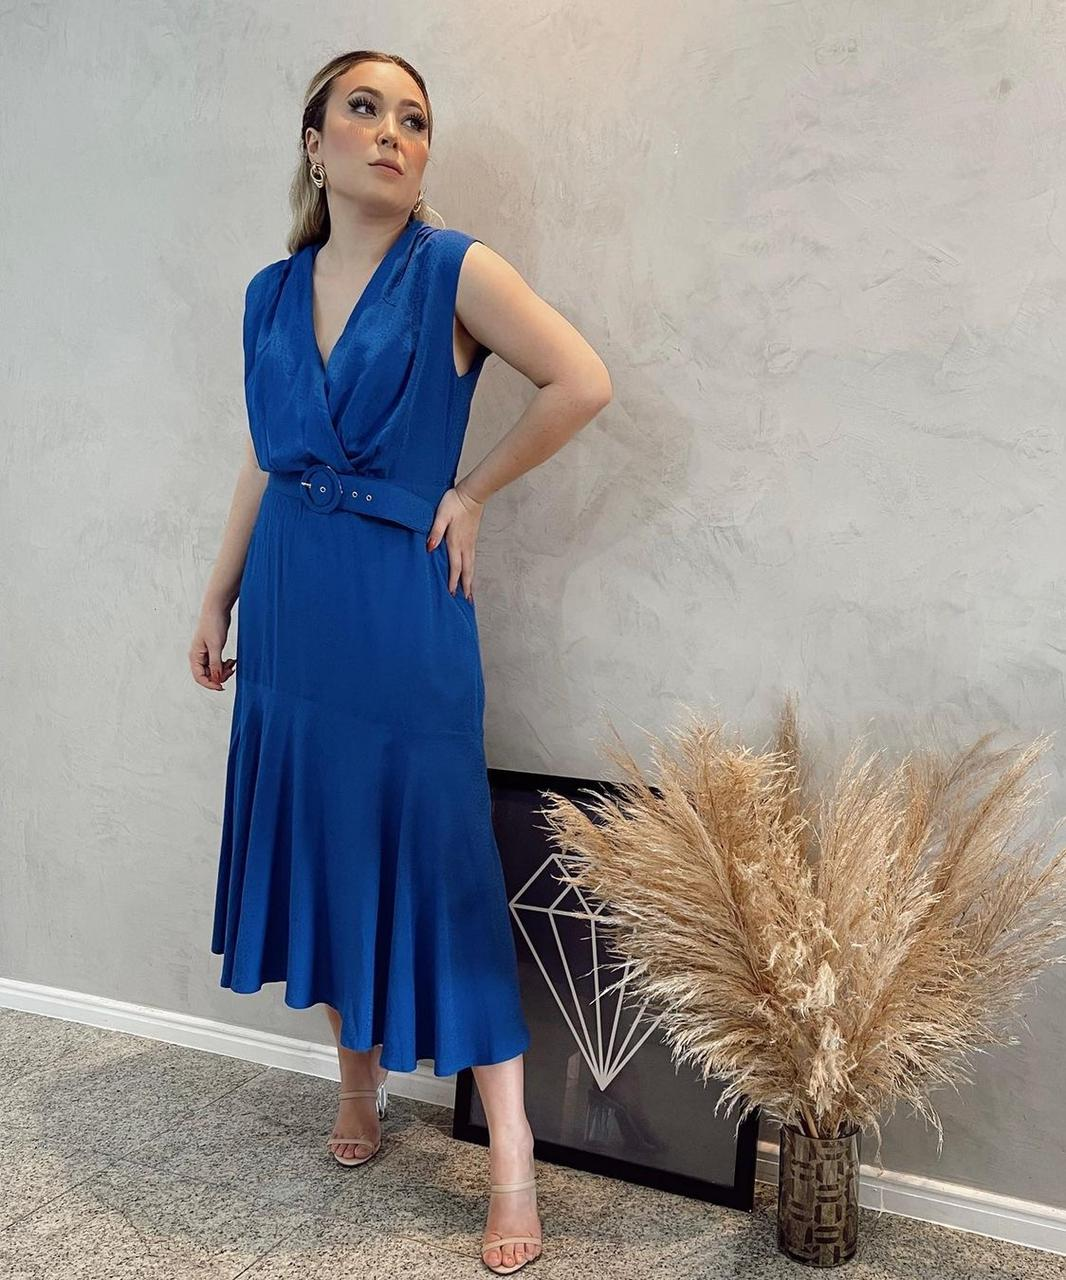 Vestido Mauy midi texturizado com cinto